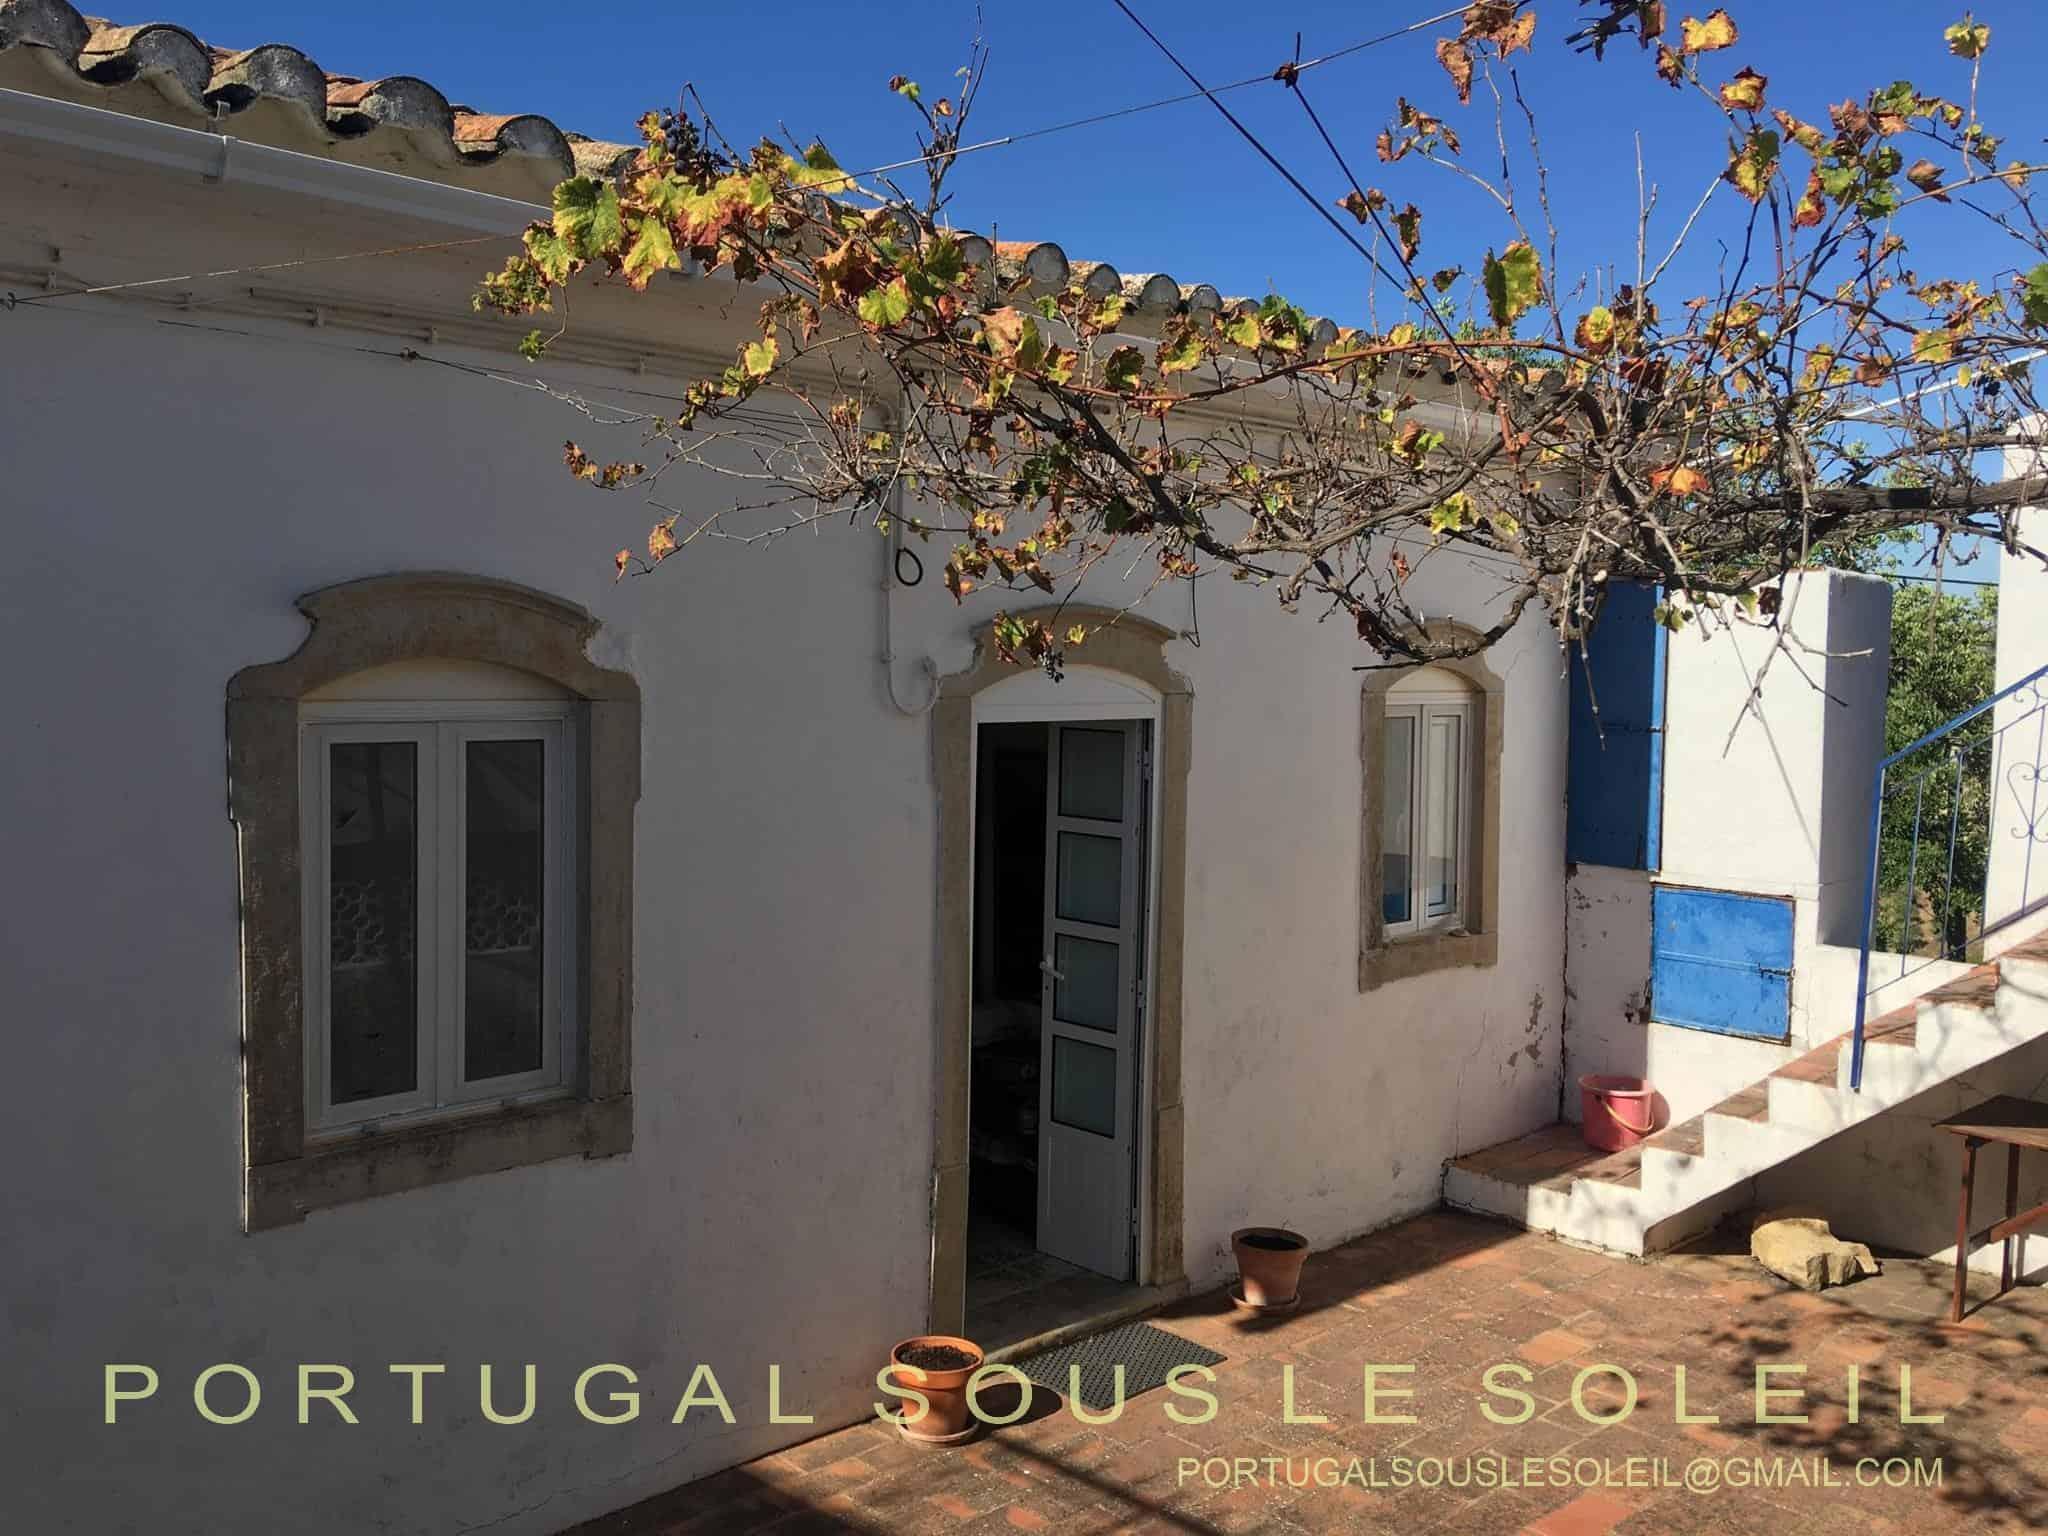 achat maison de campagne au portugal ventana blog. Black Bedroom Furniture Sets. Home Design Ideas